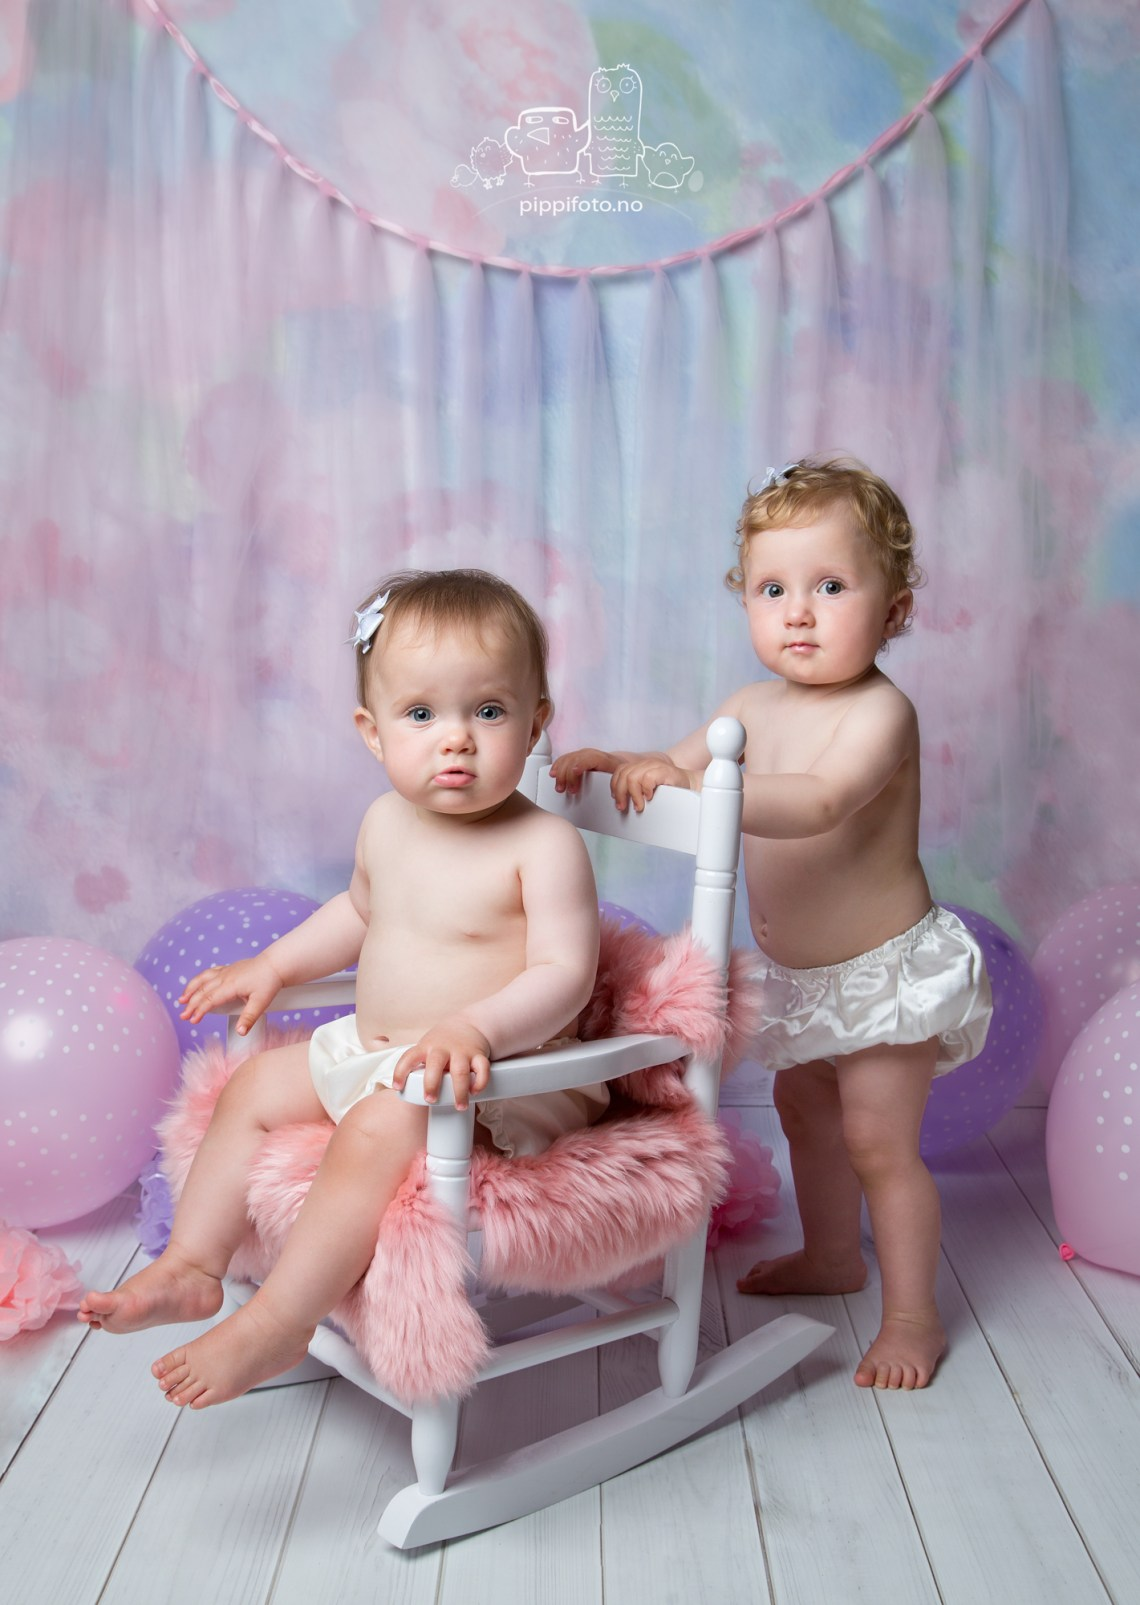 babyfotografering, babybilder, babyfoto, tvilling foto, tvillingsøster